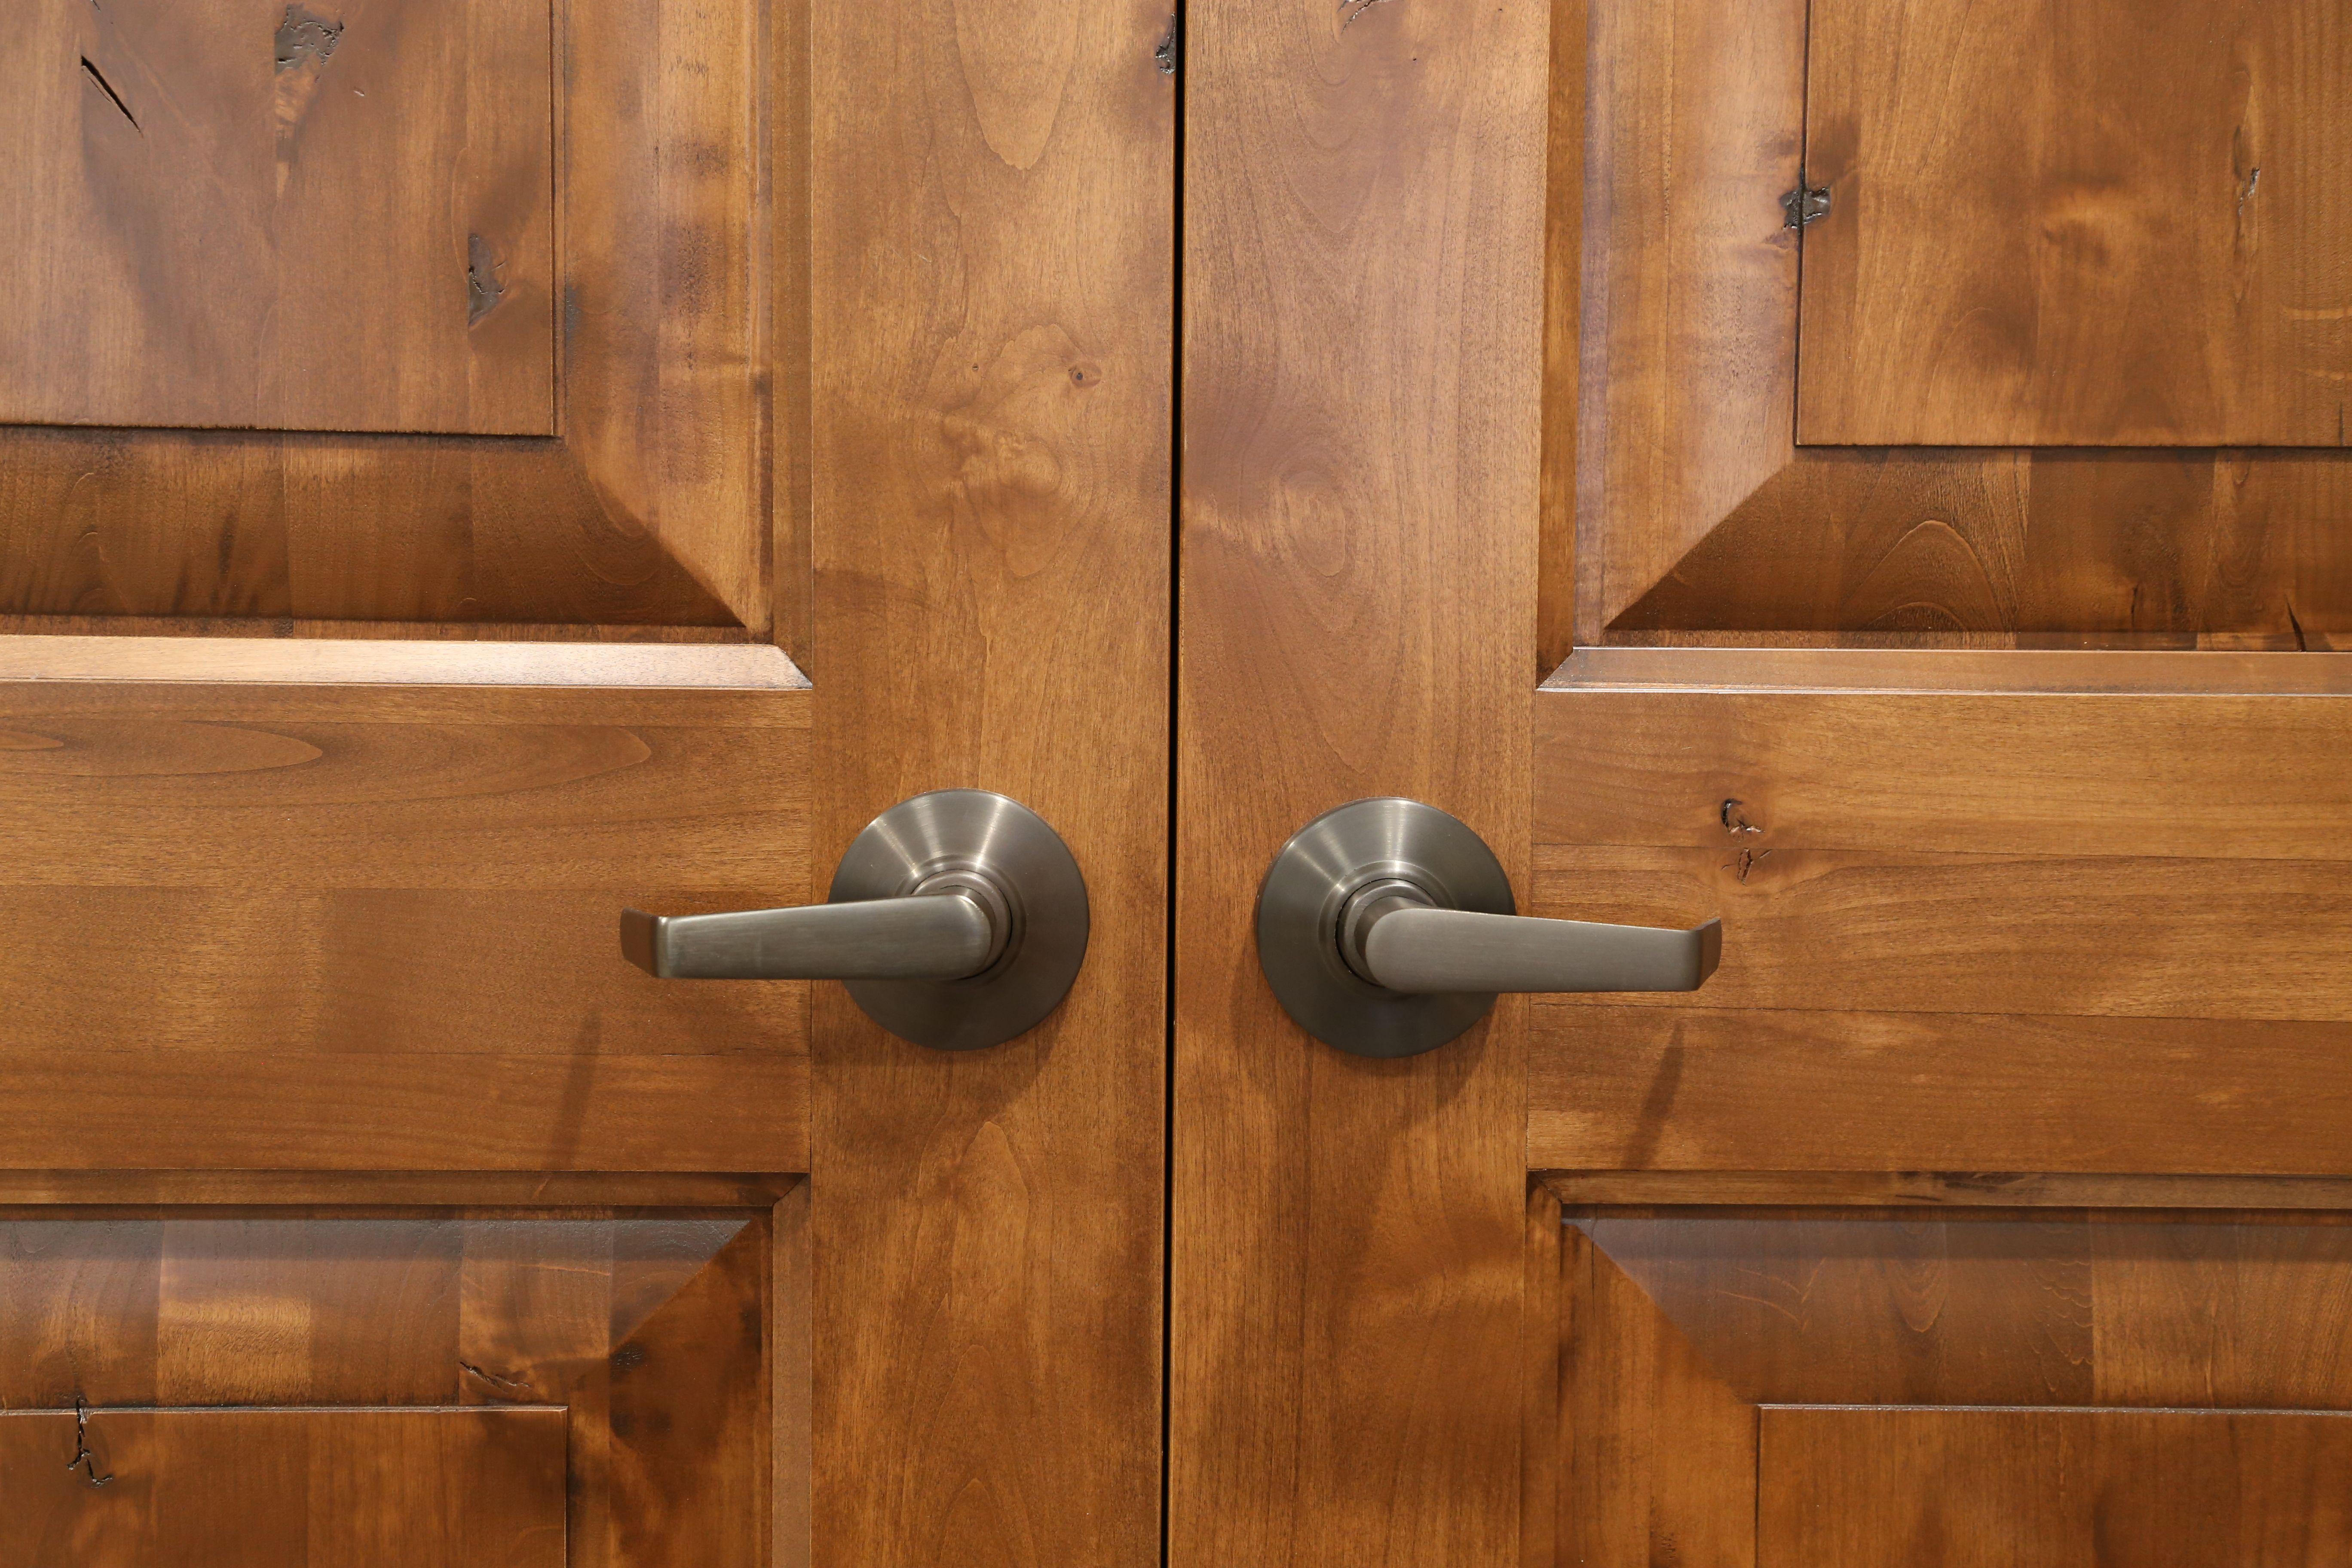 Interior Doors | Knotty Alder With Our Sierra Glaze, Pre Finish | Bayer  Built